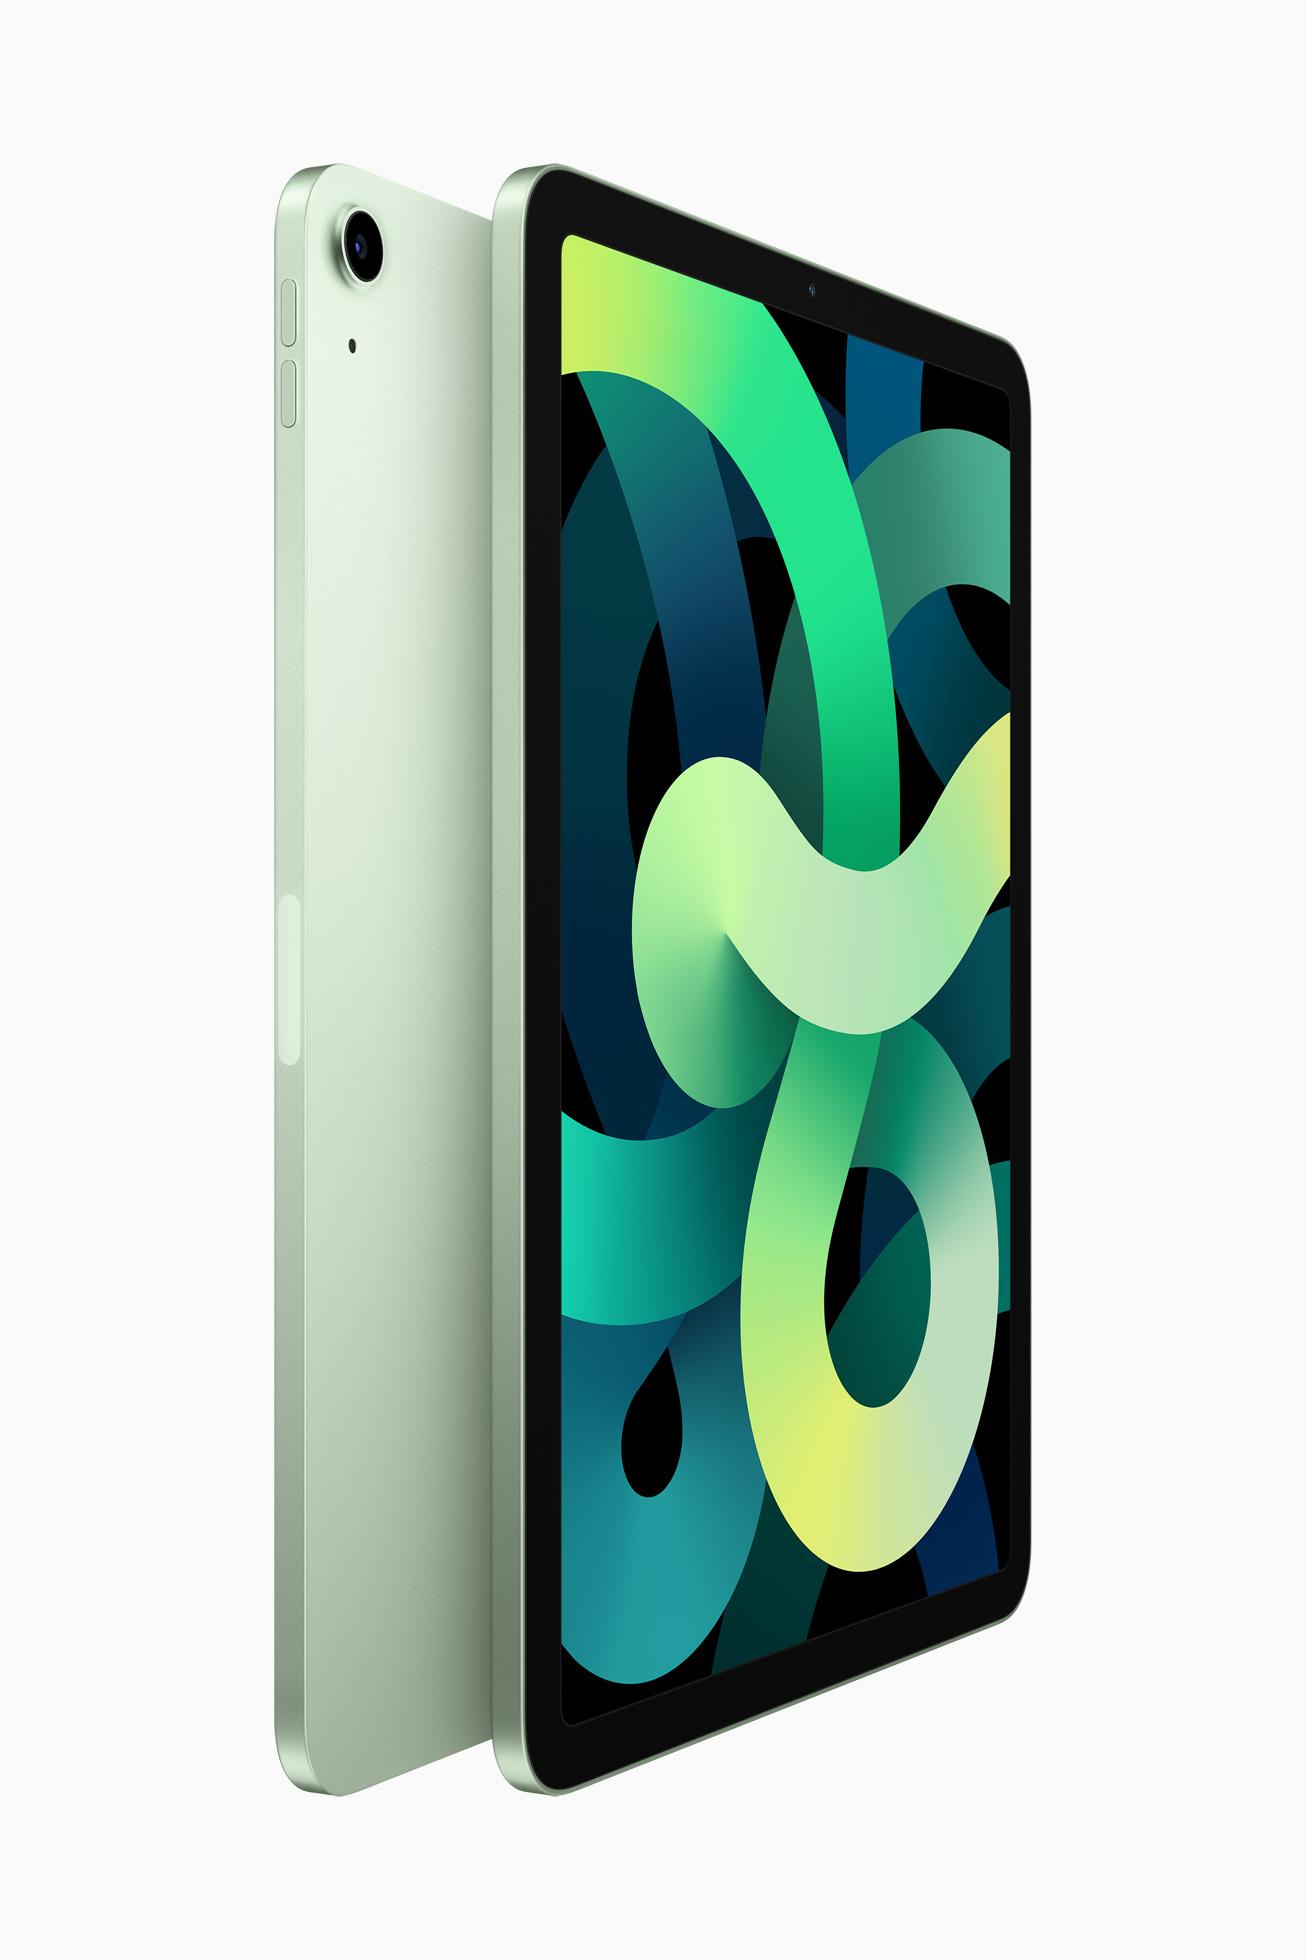 apple new ipad air green 09152020